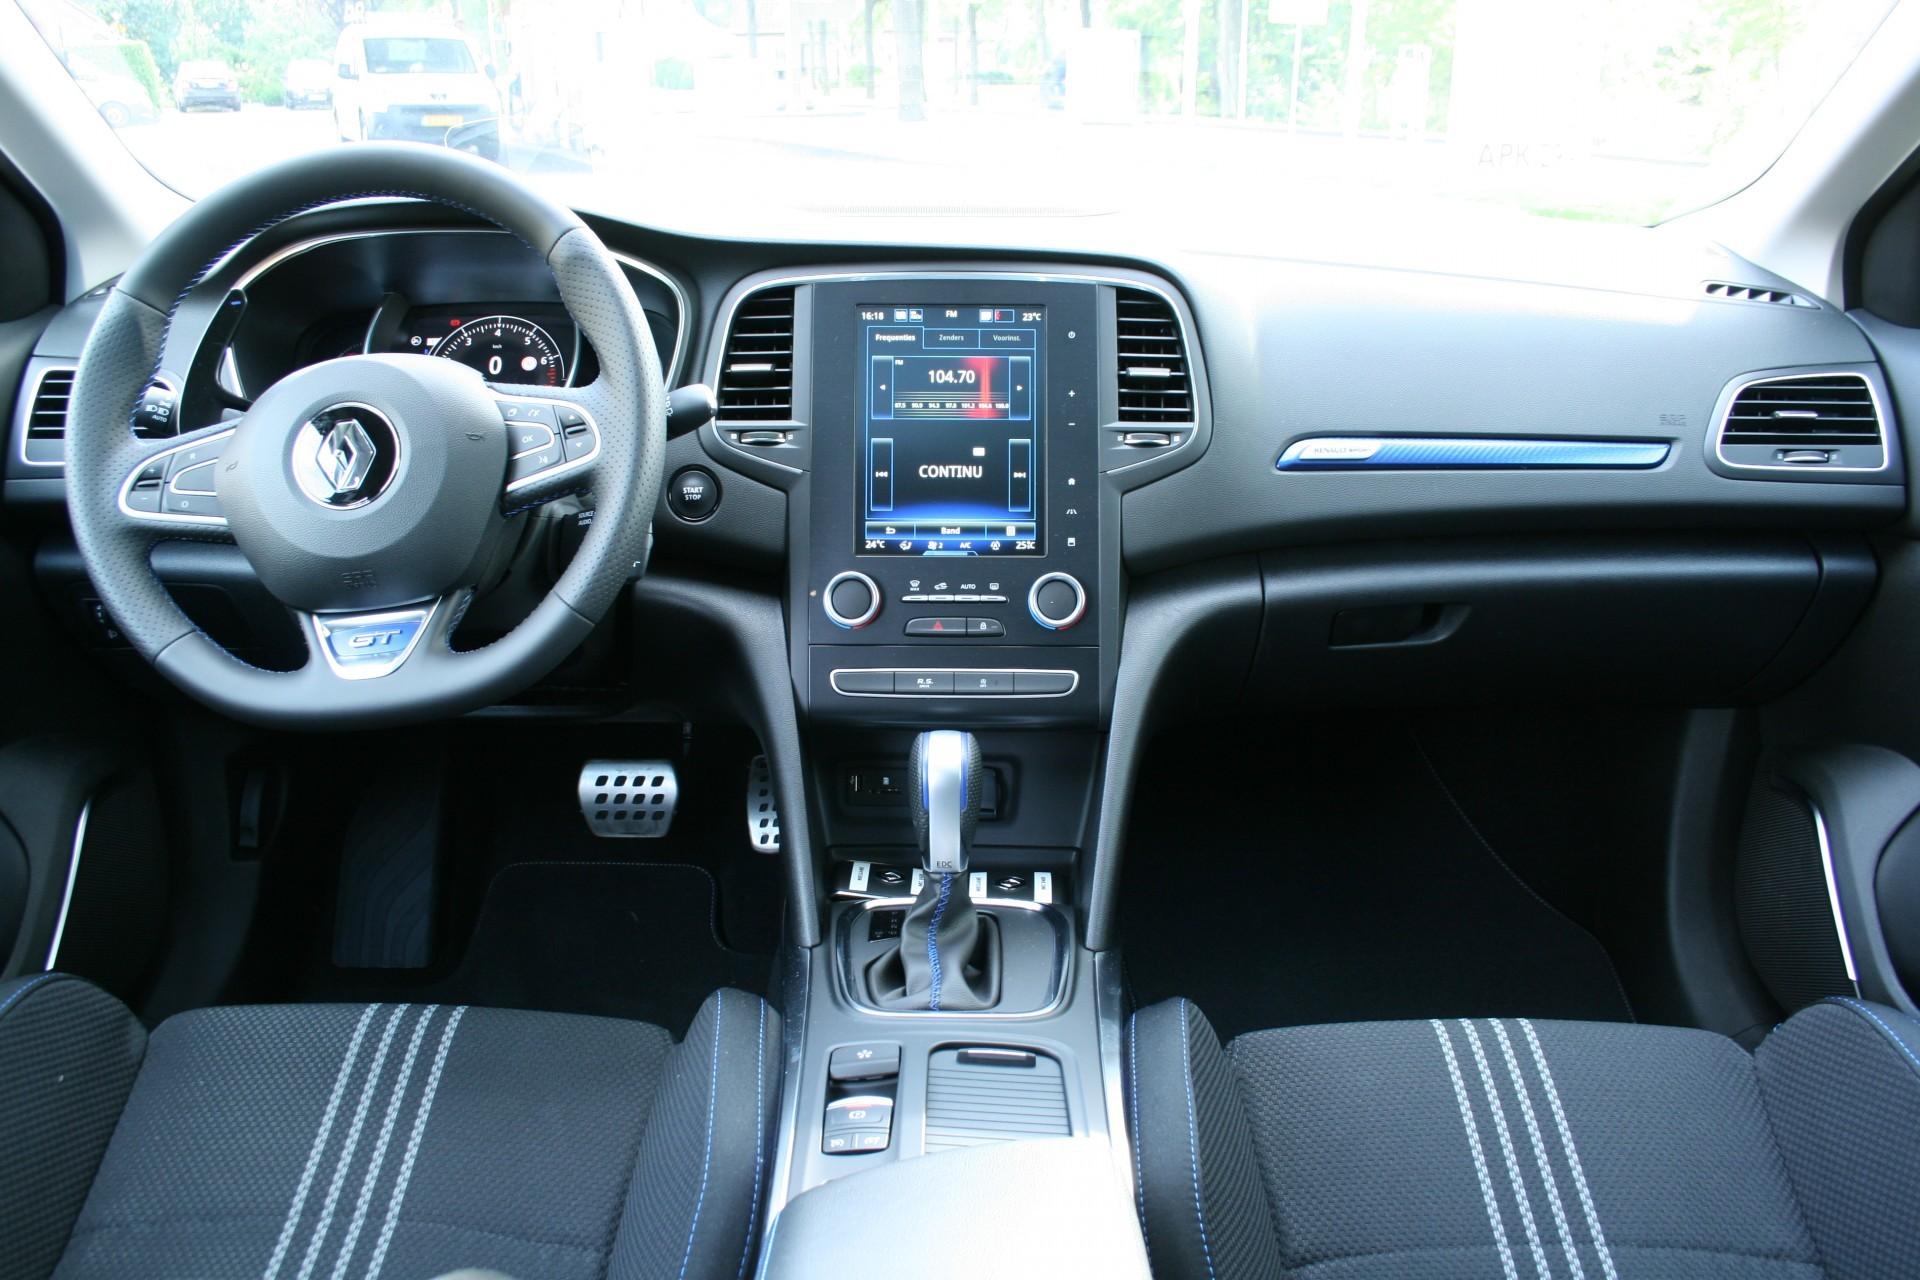 Renault Mégane foto 18